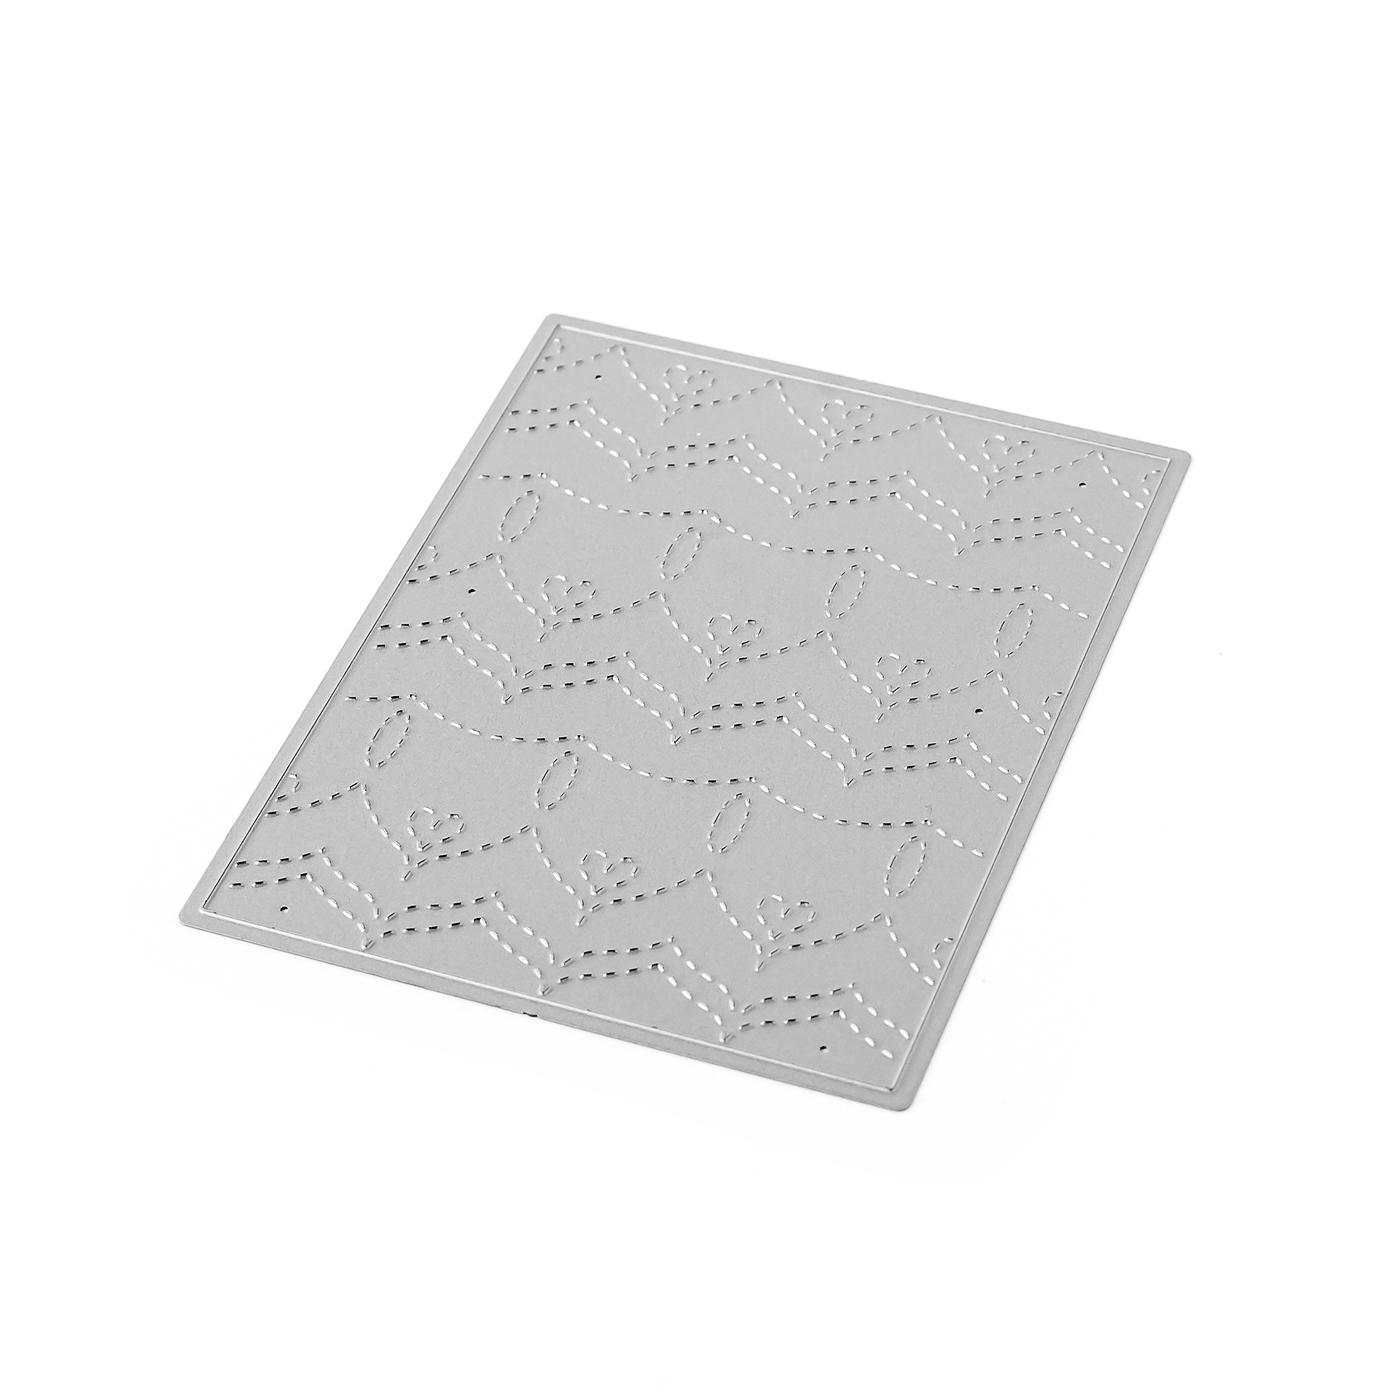 Pigment Cozy Stitches Cover Plate